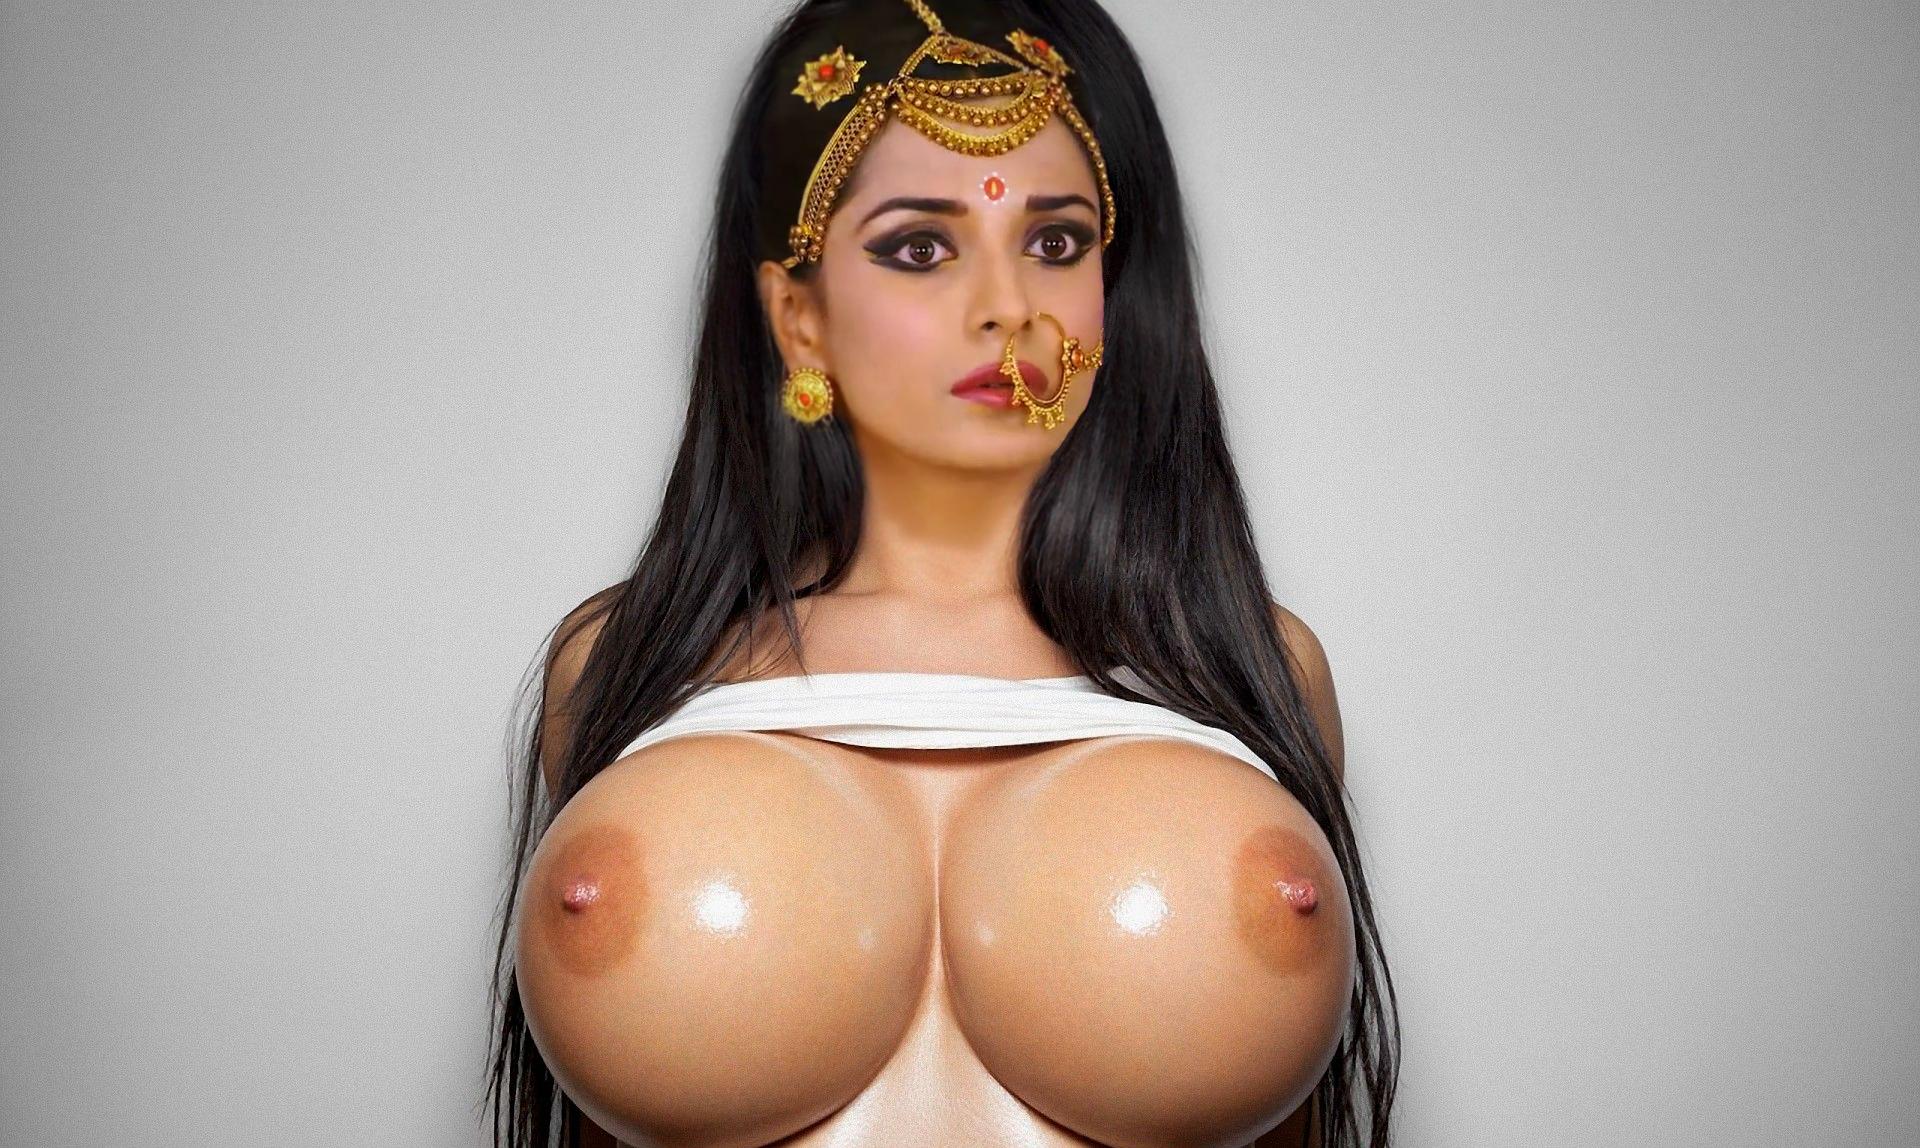 Pooja bedi nude nude desi actress